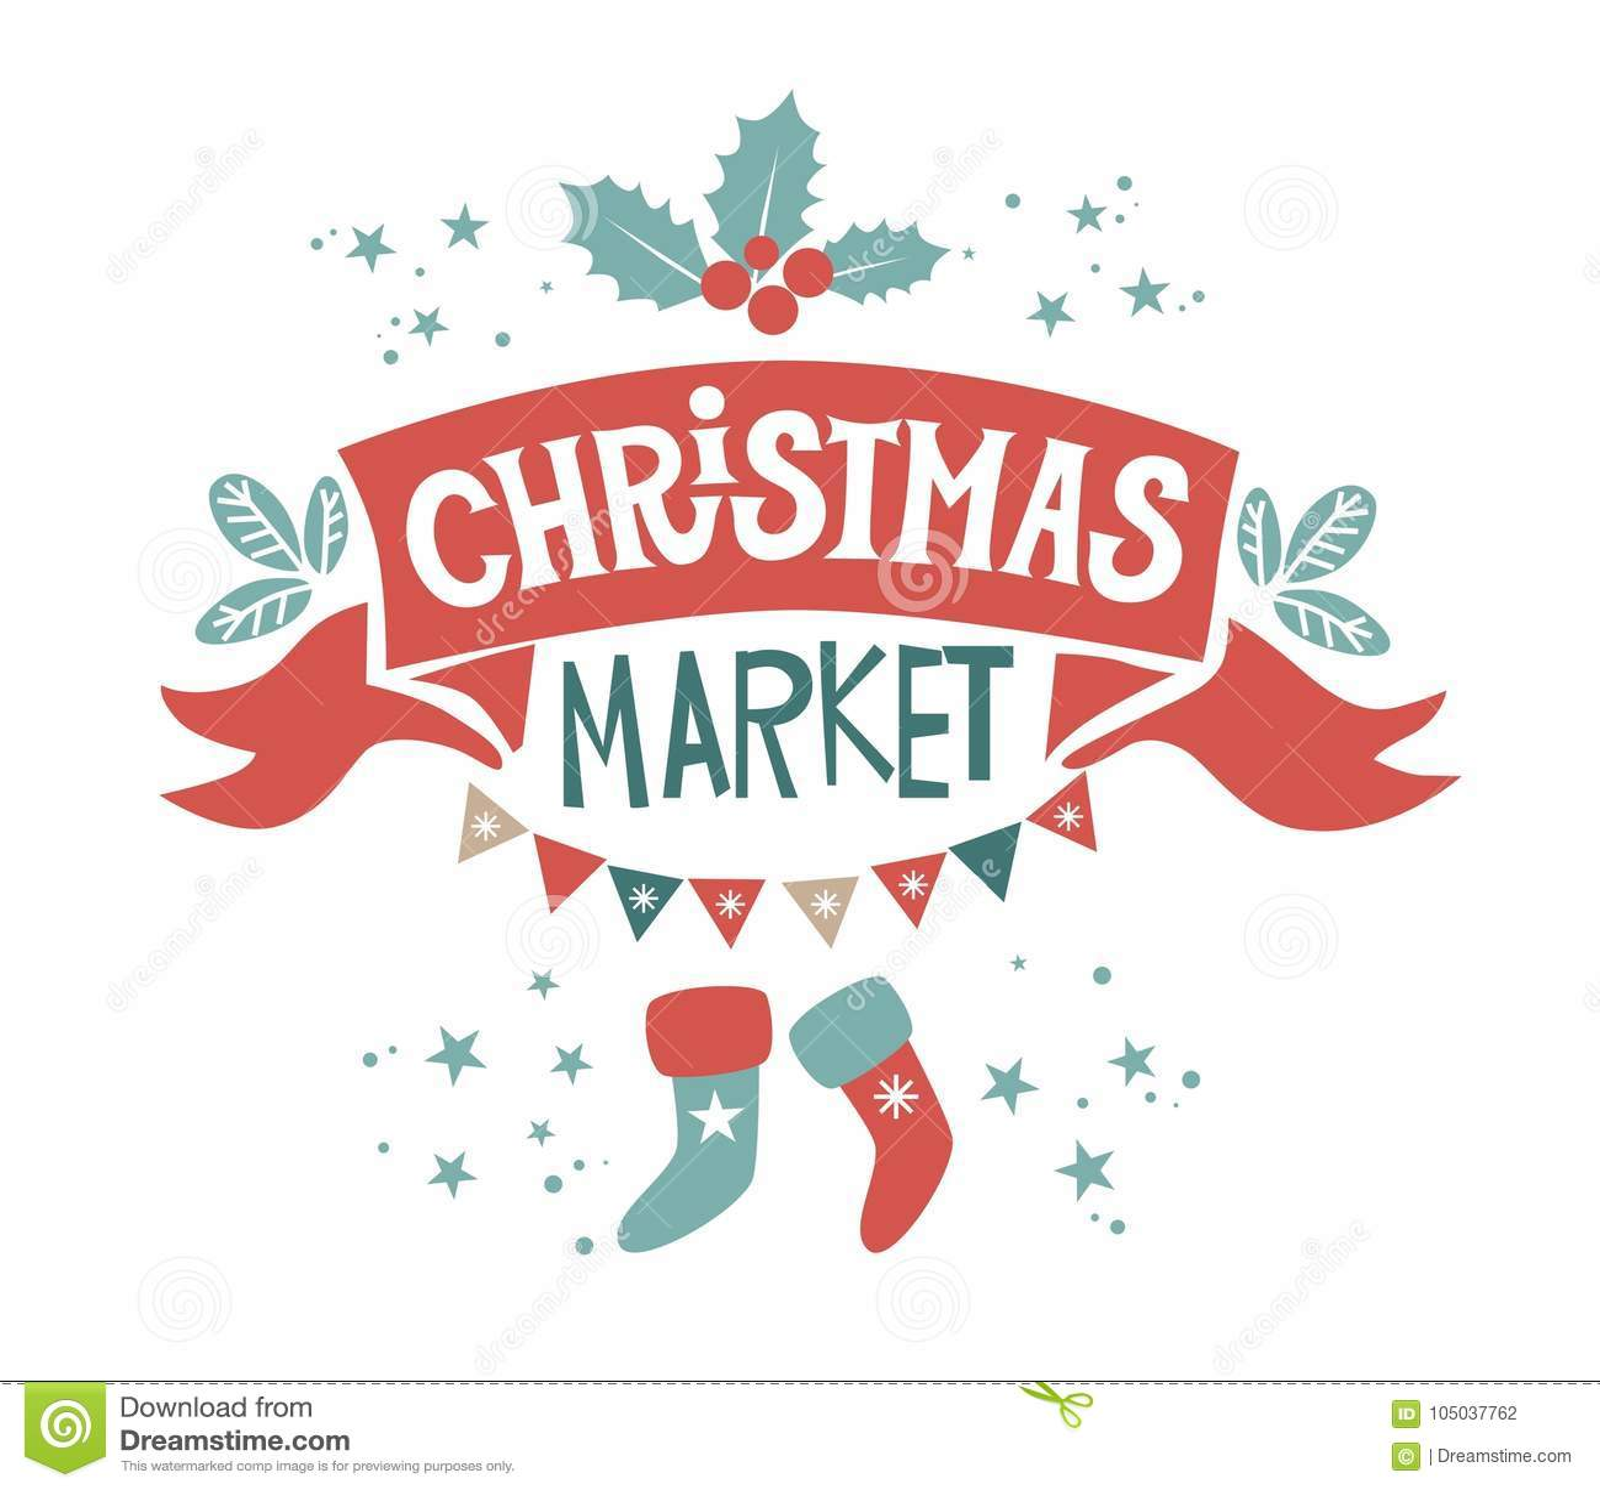 Christmas Market Illustration Stock Illustration - Illustration of ...